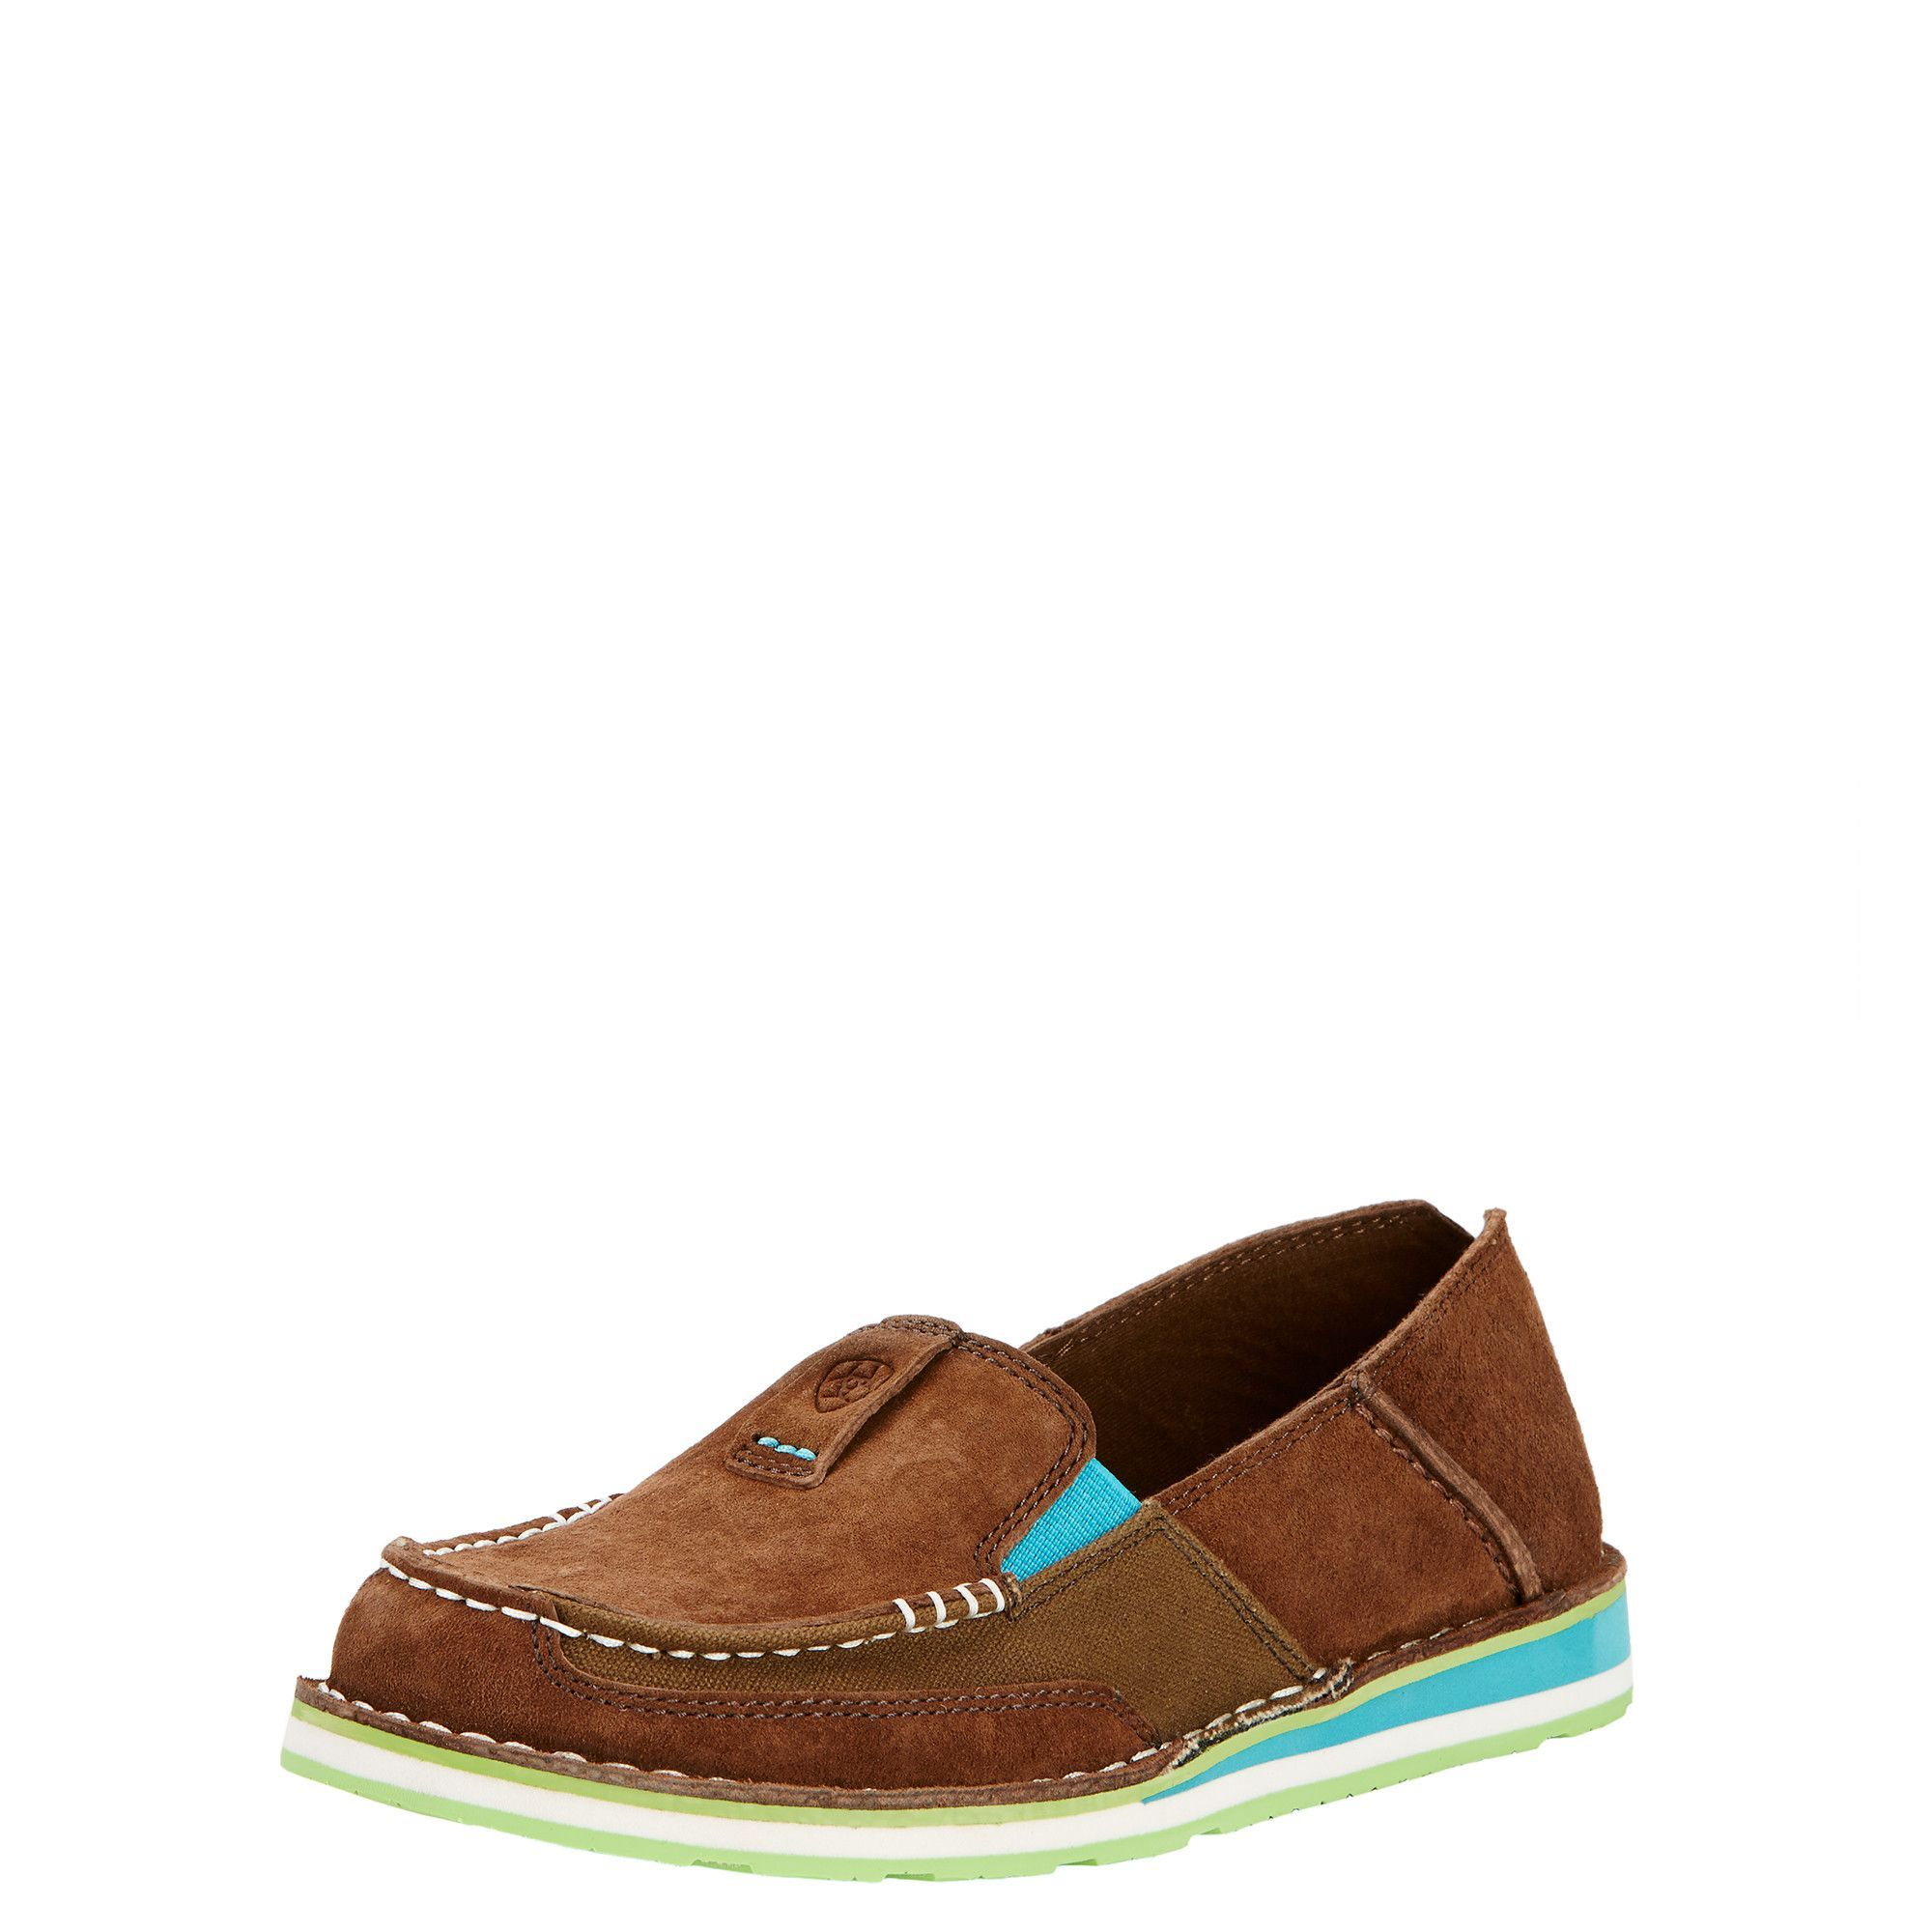 Ariat Casual Shoes Womens Cruiser Slip On EVA Panels Brown 10017457